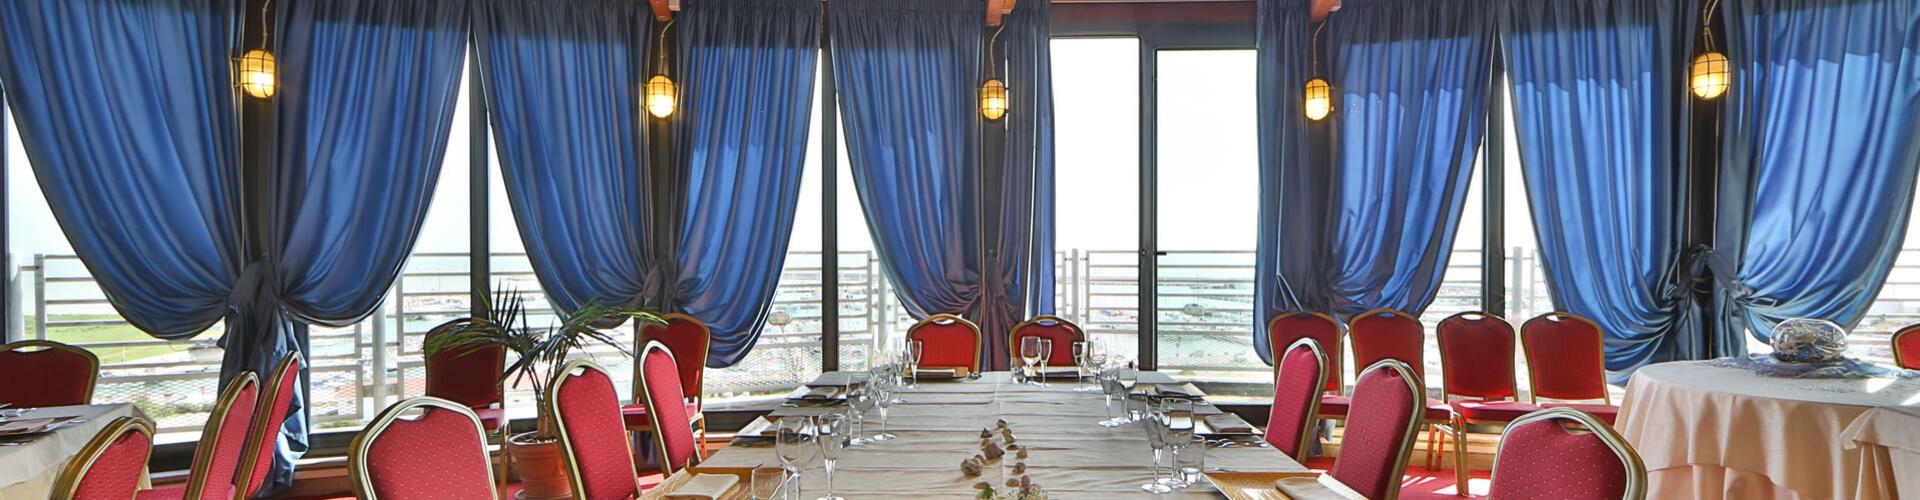 hoteldavidpalace it ristorante 001